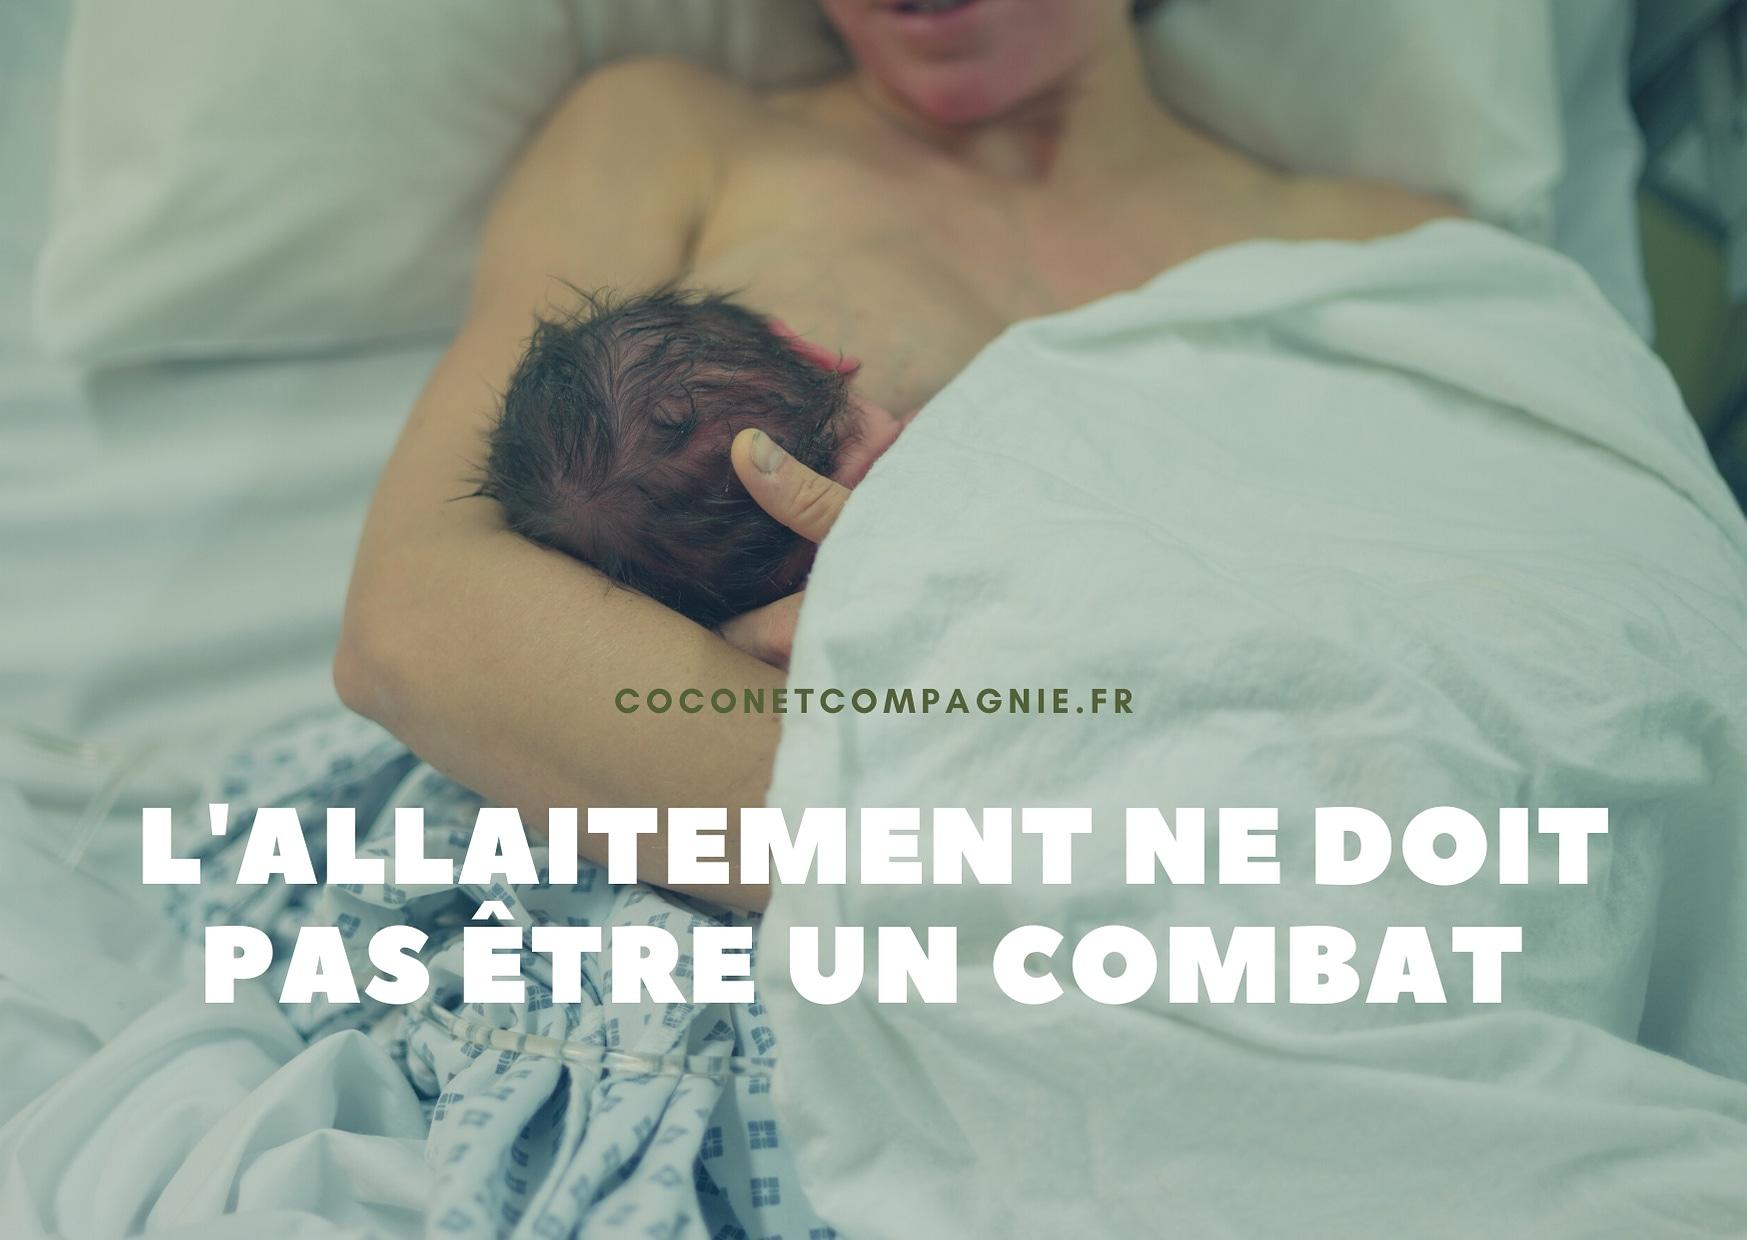 allaitement_combat_cocon_compagnie